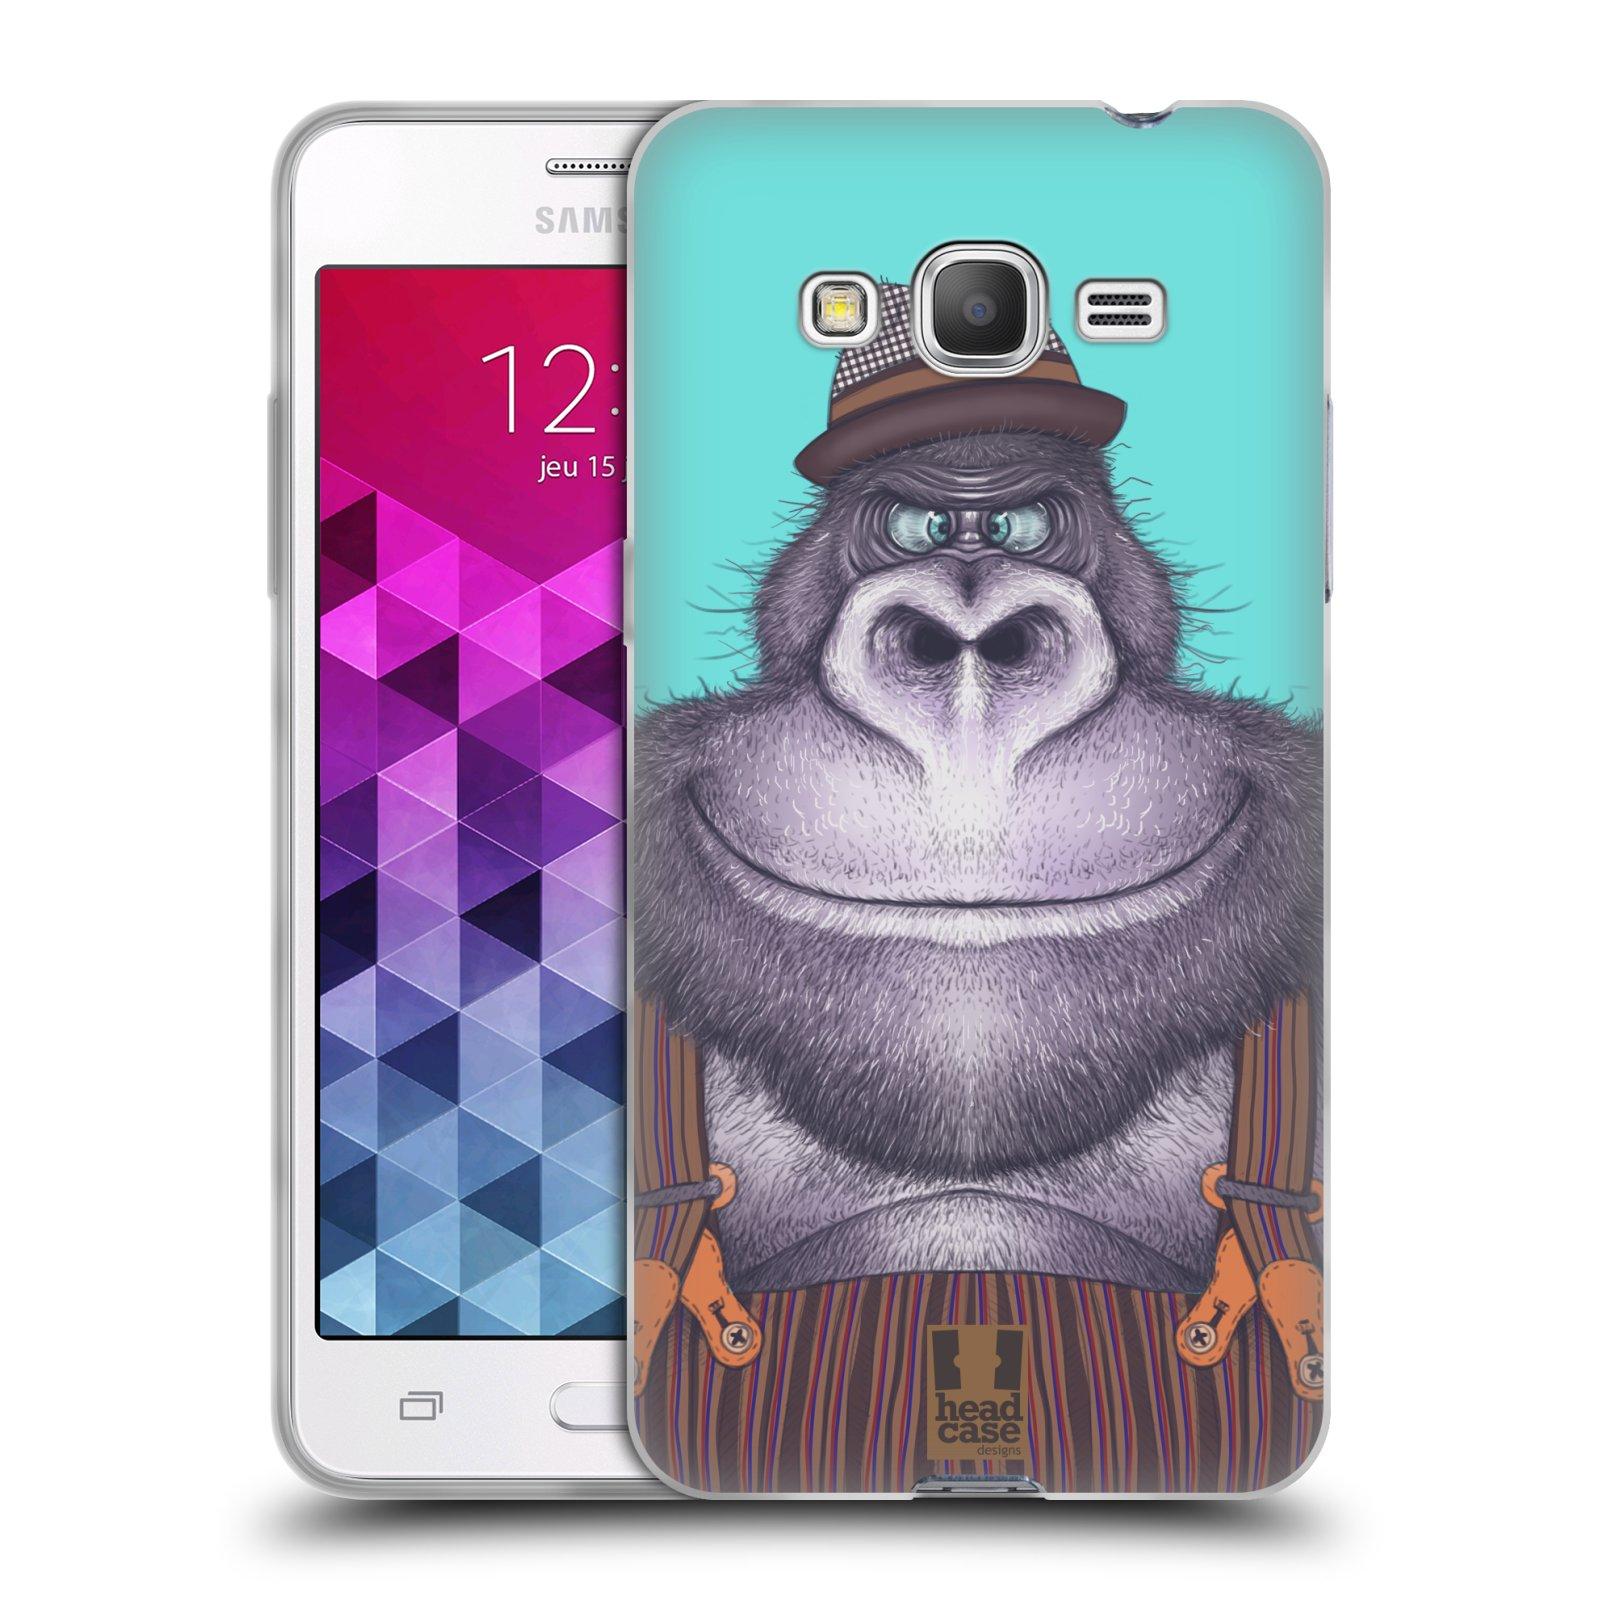 Silikonové pouzdro na mobil Samsung Galaxy Grand Prime VE HEAD CASE ANIMPLA GORILÁK